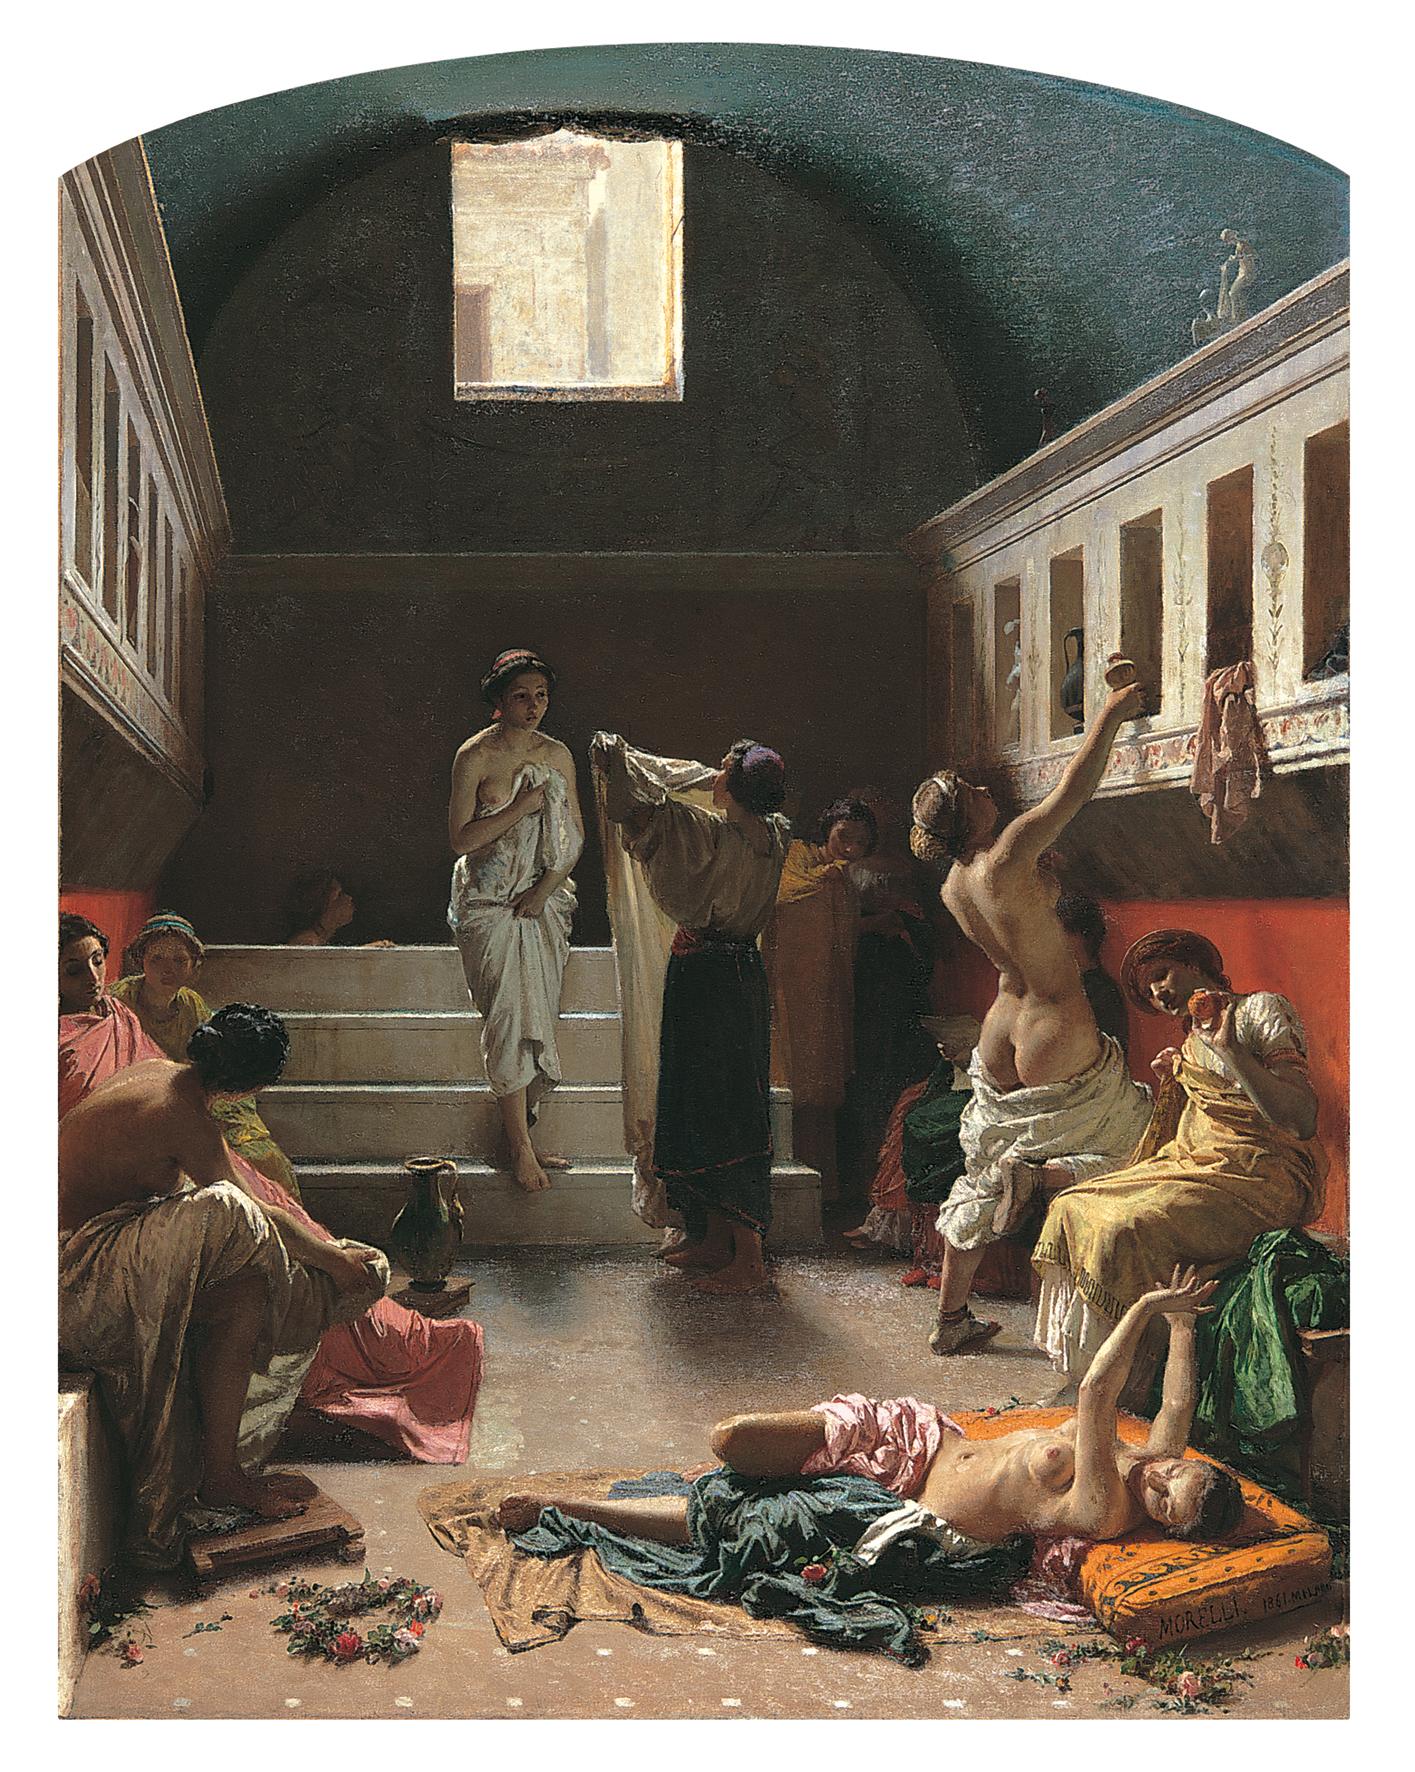 Achille Beltrame  Ritratto muliebre  191017 ca  Artribune